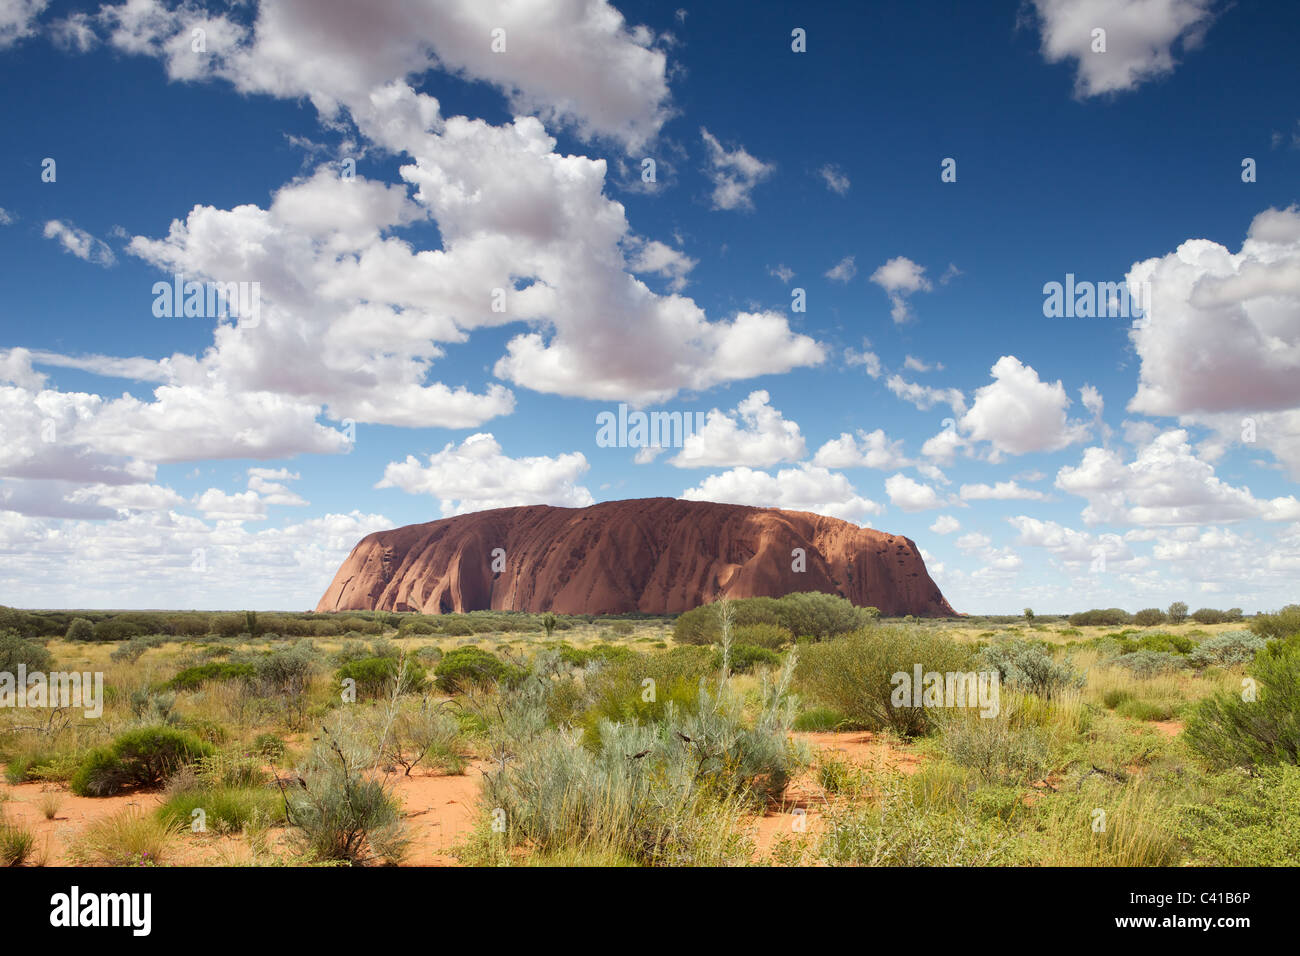 Ayres Rock - Uluru - Red Rock nel cuore dell'entroterra Foto Stock